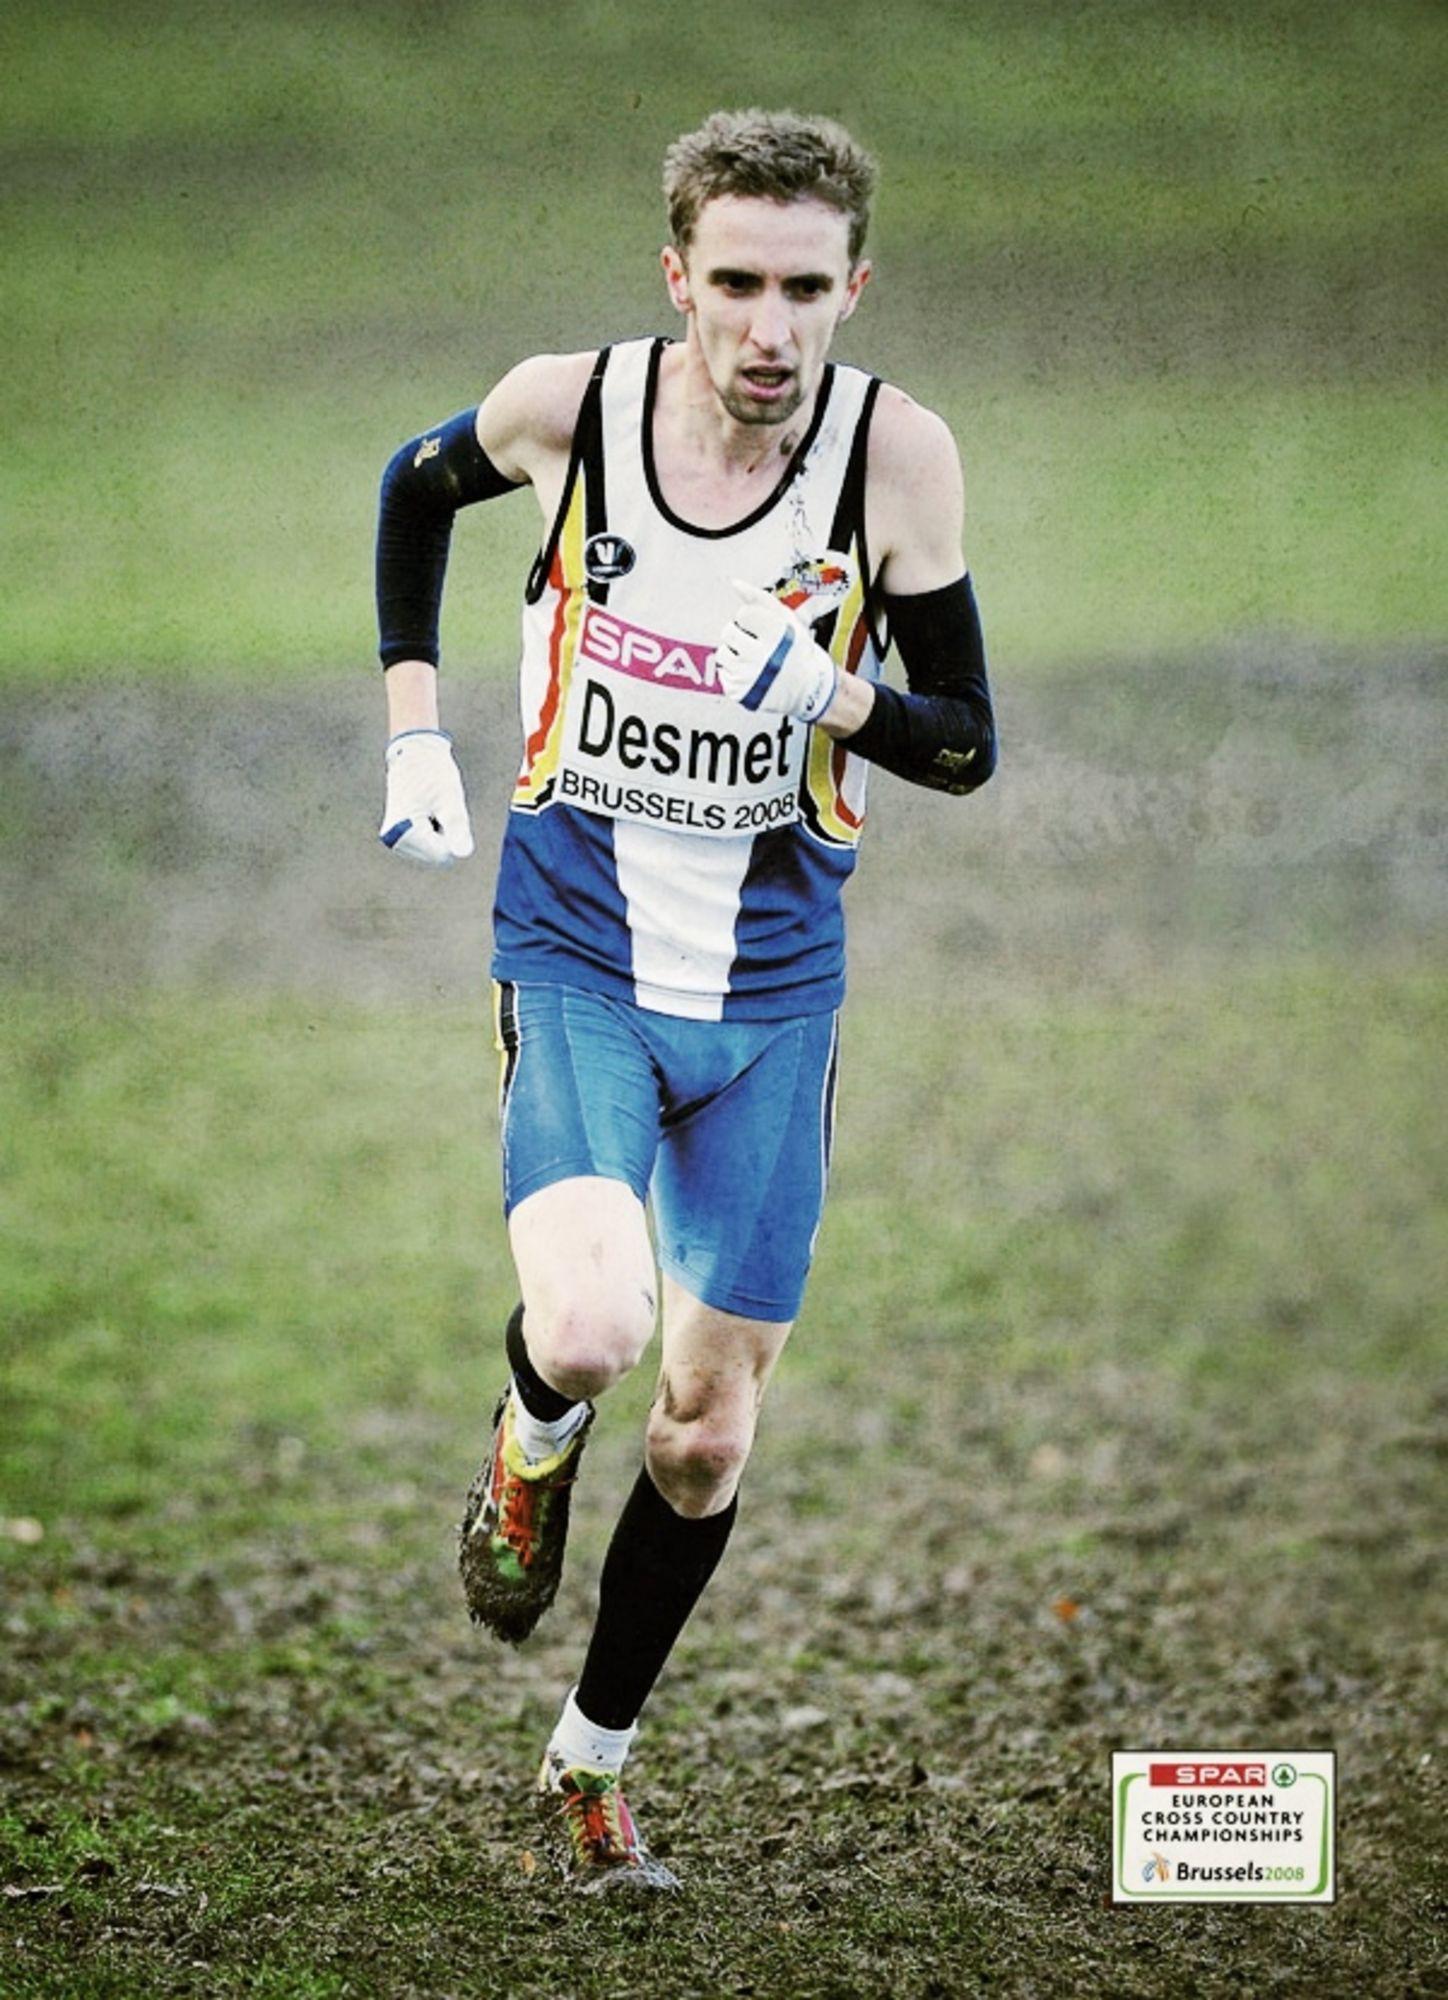 Pieter Desmet